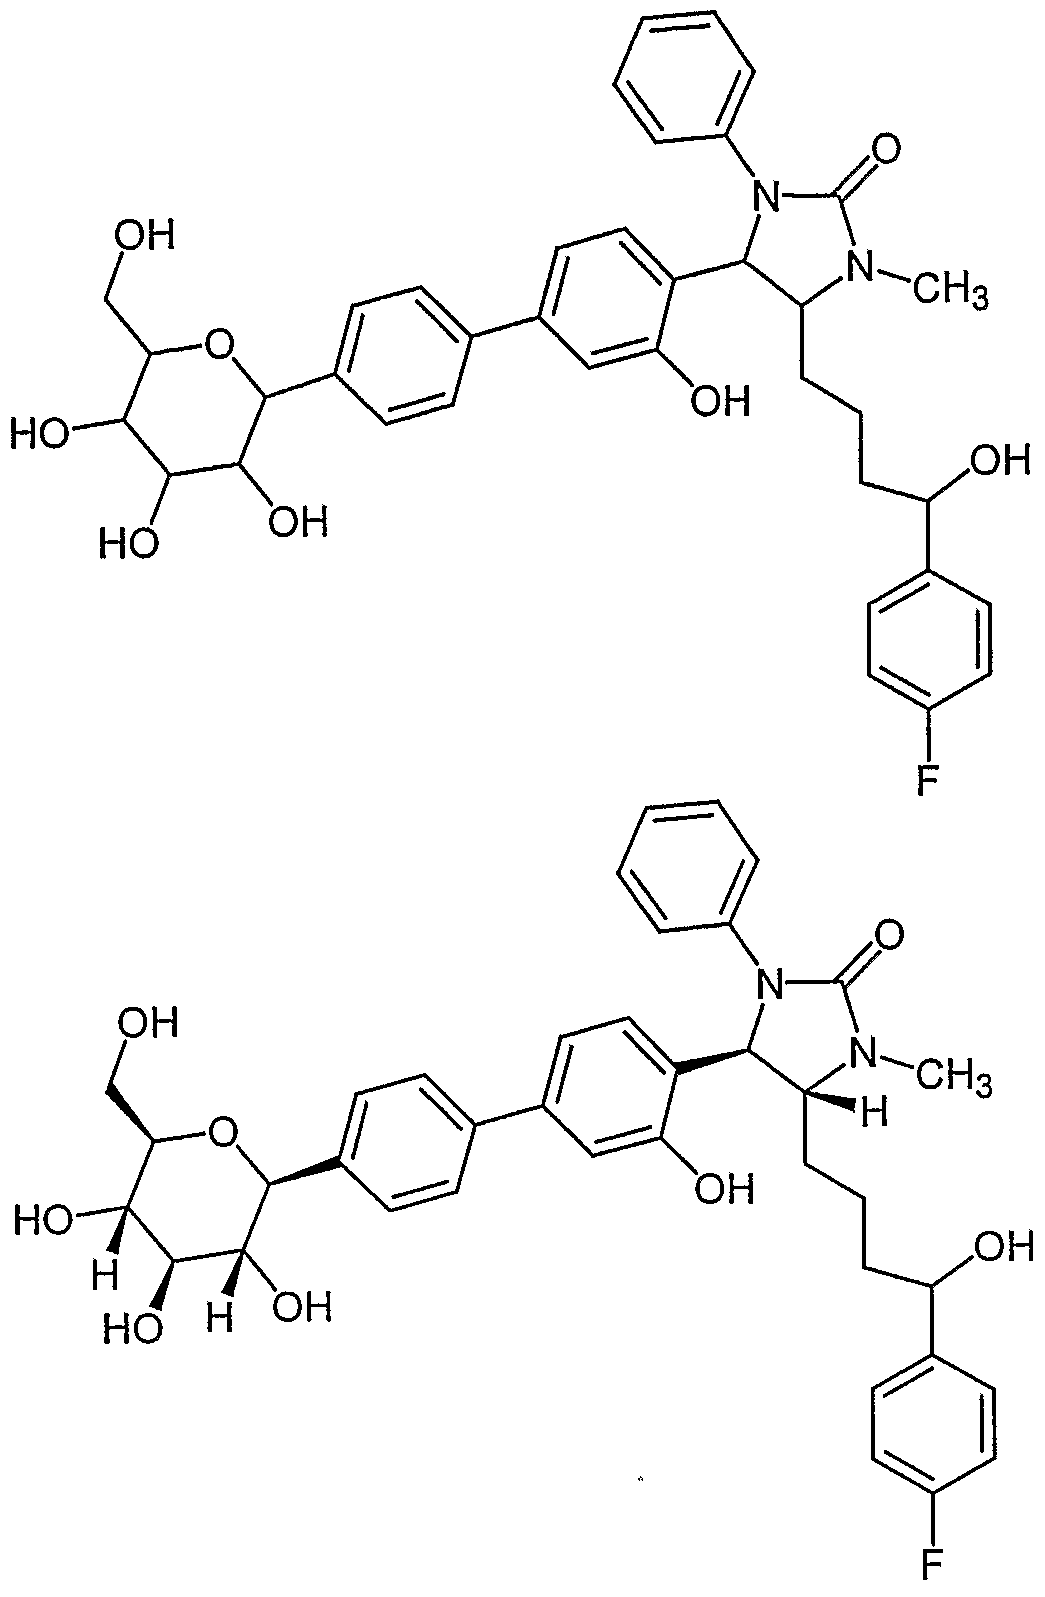 Wo2006102674a2 Diphenylheterocycle Cholesterol Absorption Hf Data Diagrams O 2 Meta Dibromobenzene Figure Imgf000055 0001